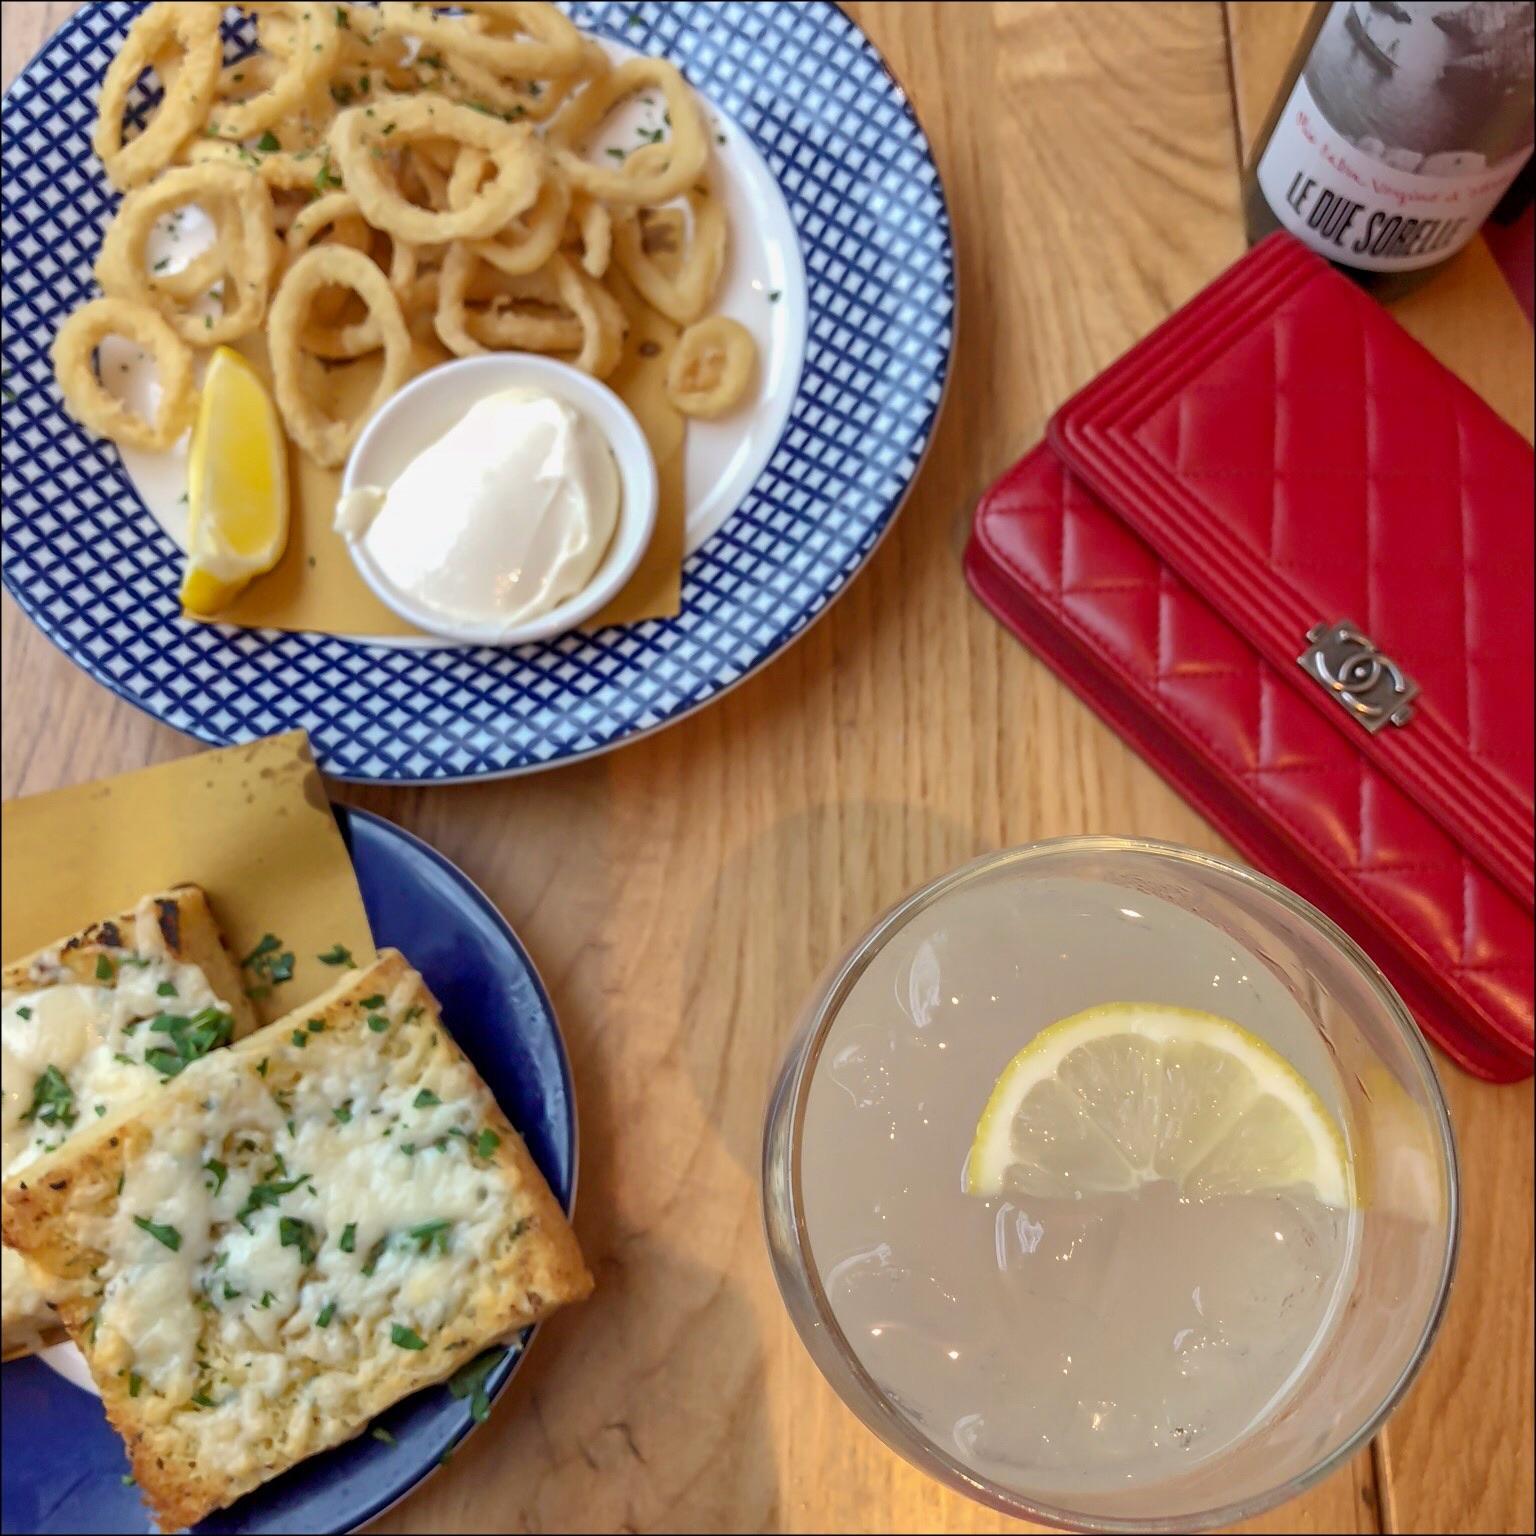 my midlife fashion, carluccios, carluccios calamari fritti, carluccios garlic with provolone cheese focaccia, carluccios sicilian spritz